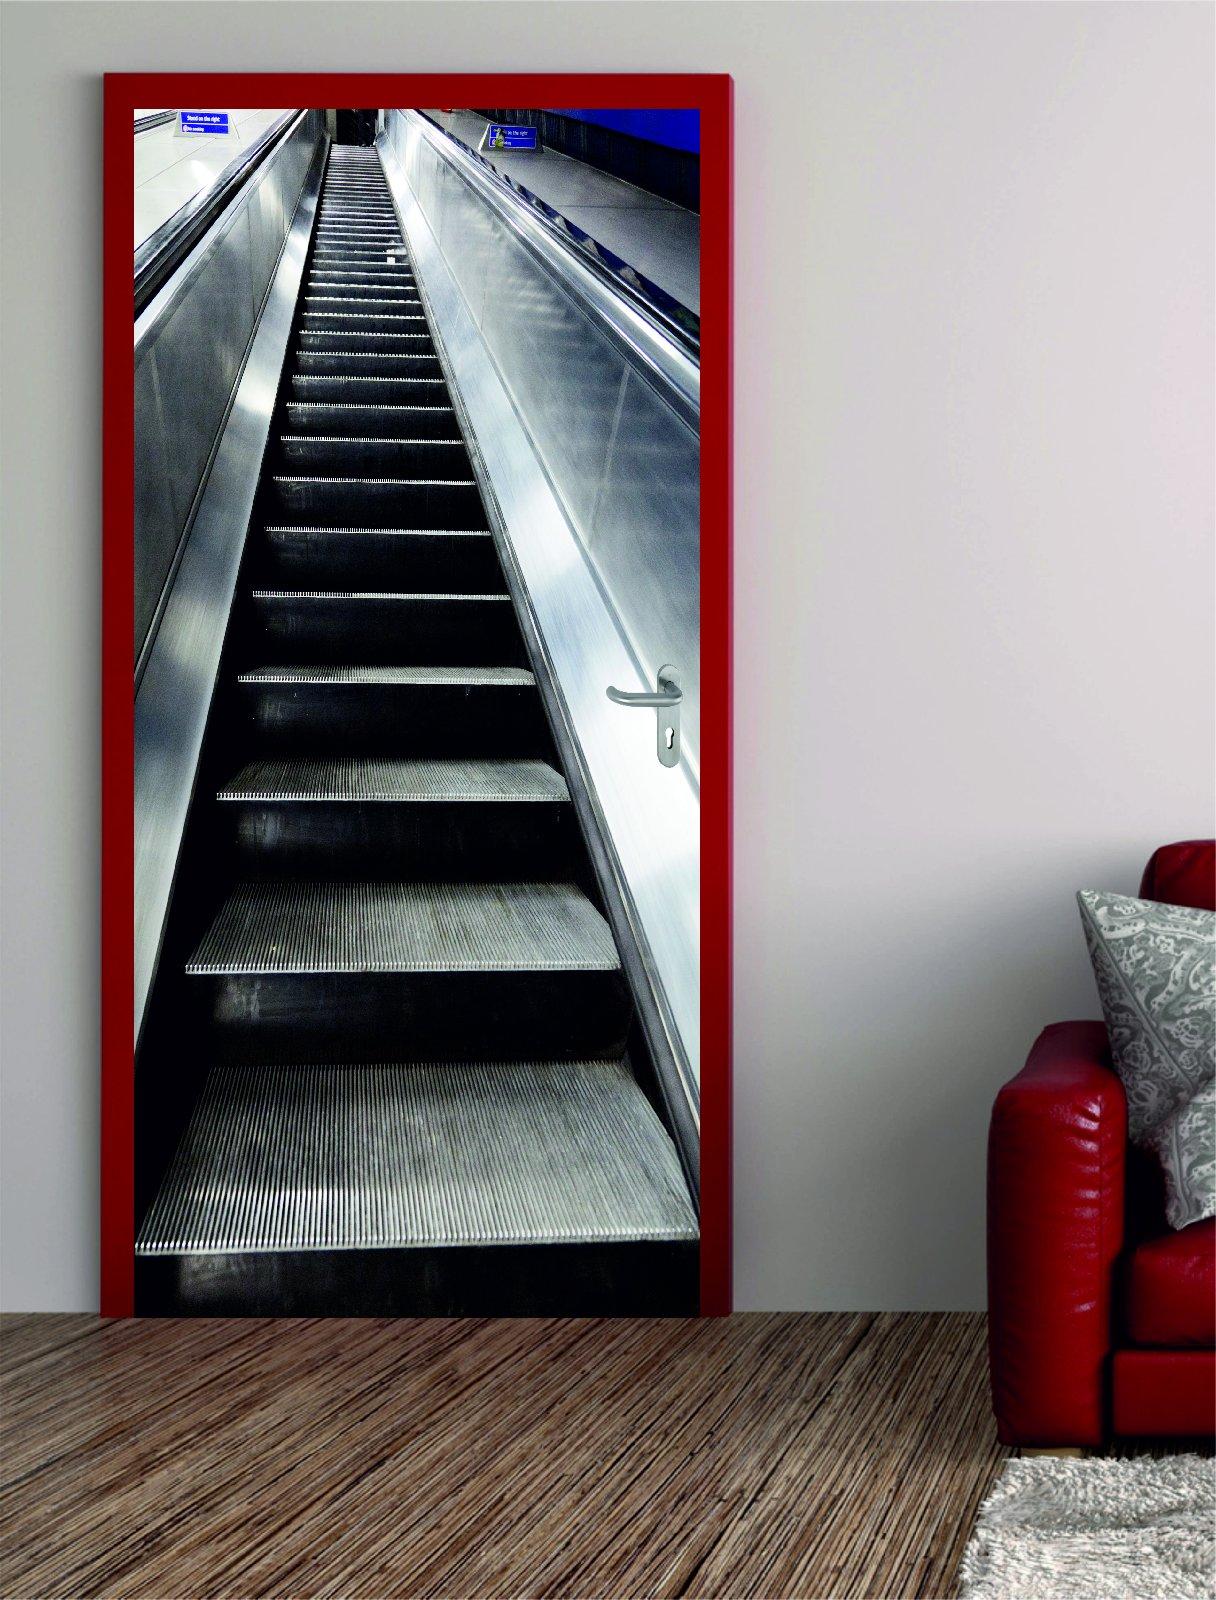 digitaldruck t rposter rolltreppe t raufkleber t rfolie t rtapete. Black Bedroom Furniture Sets. Home Design Ideas